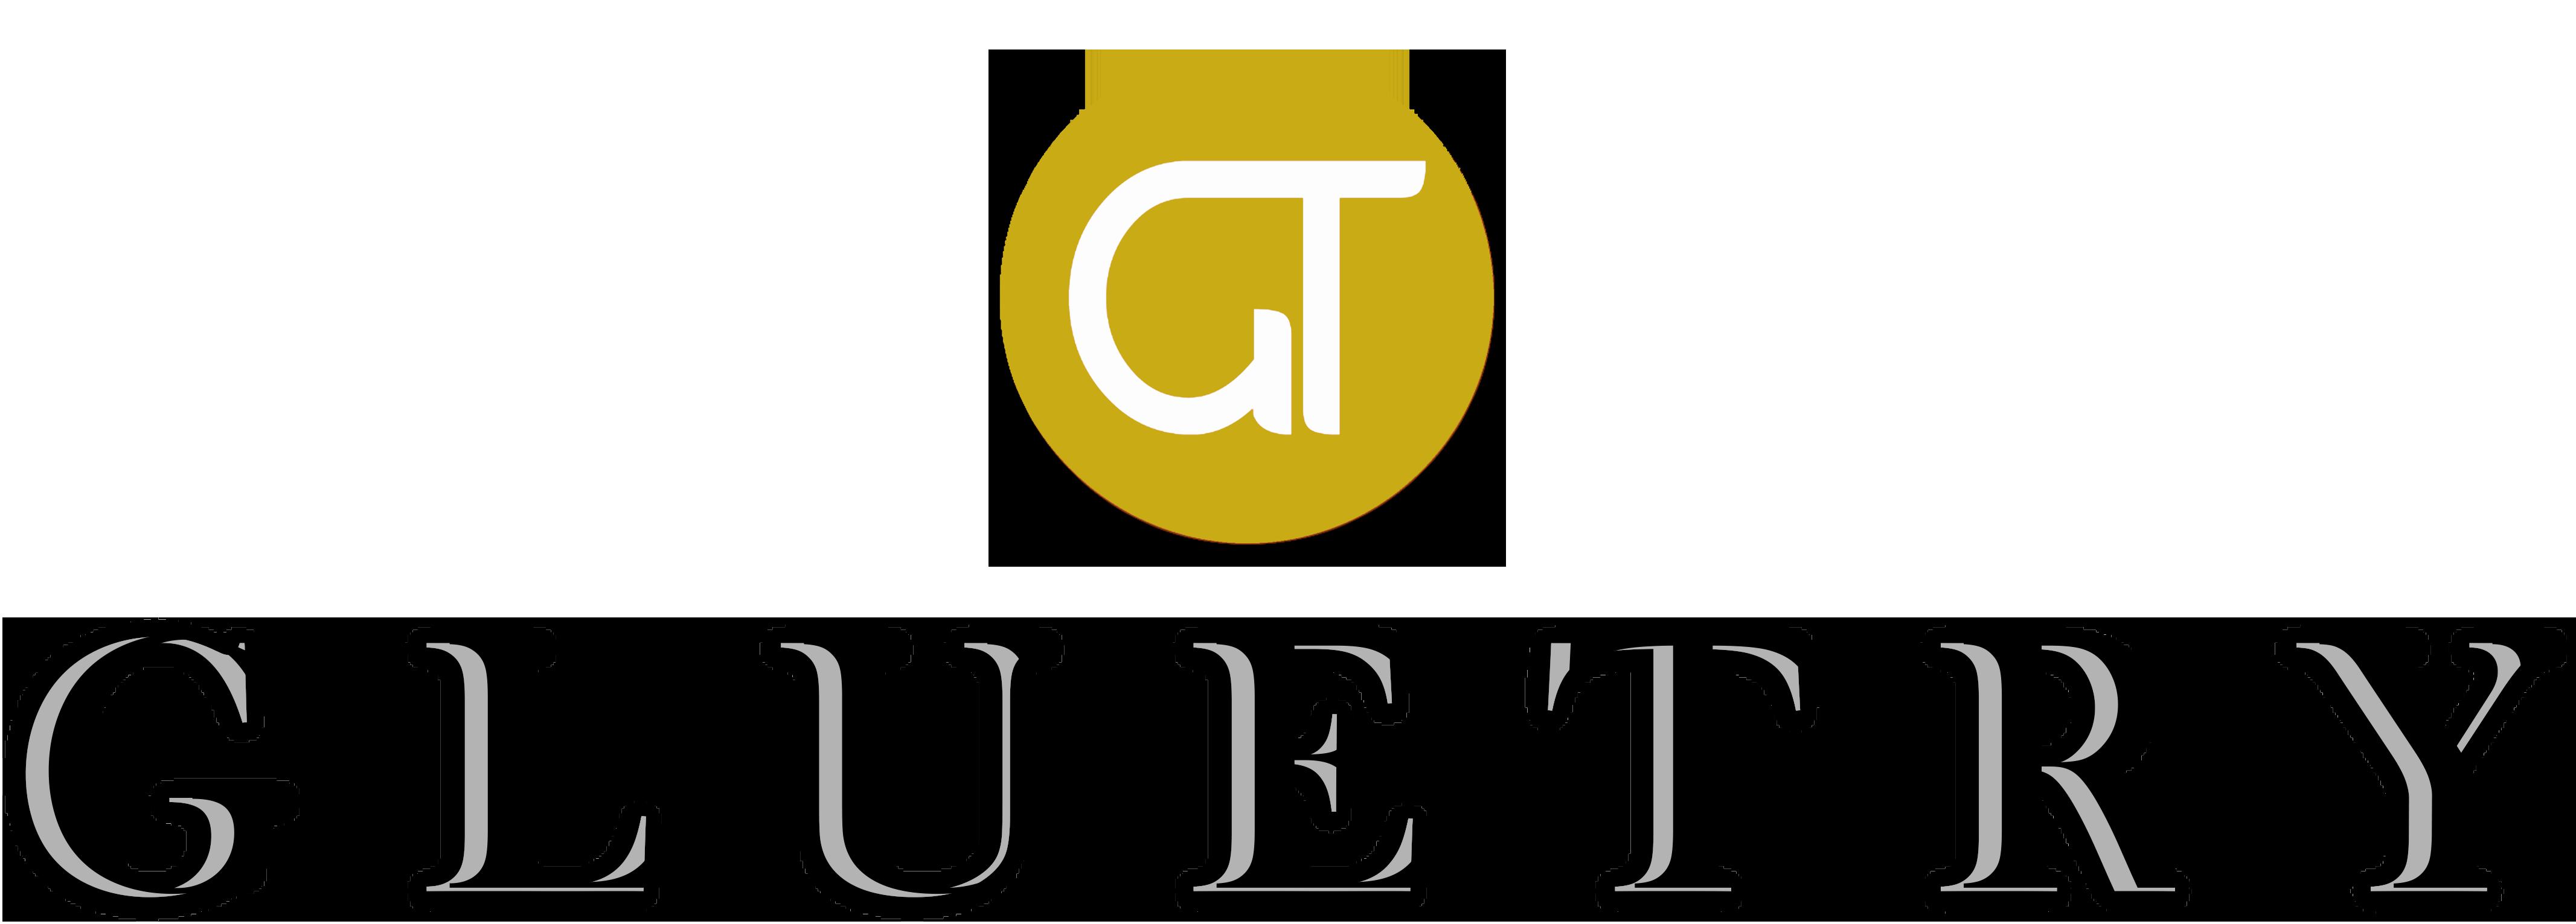 Gluetry